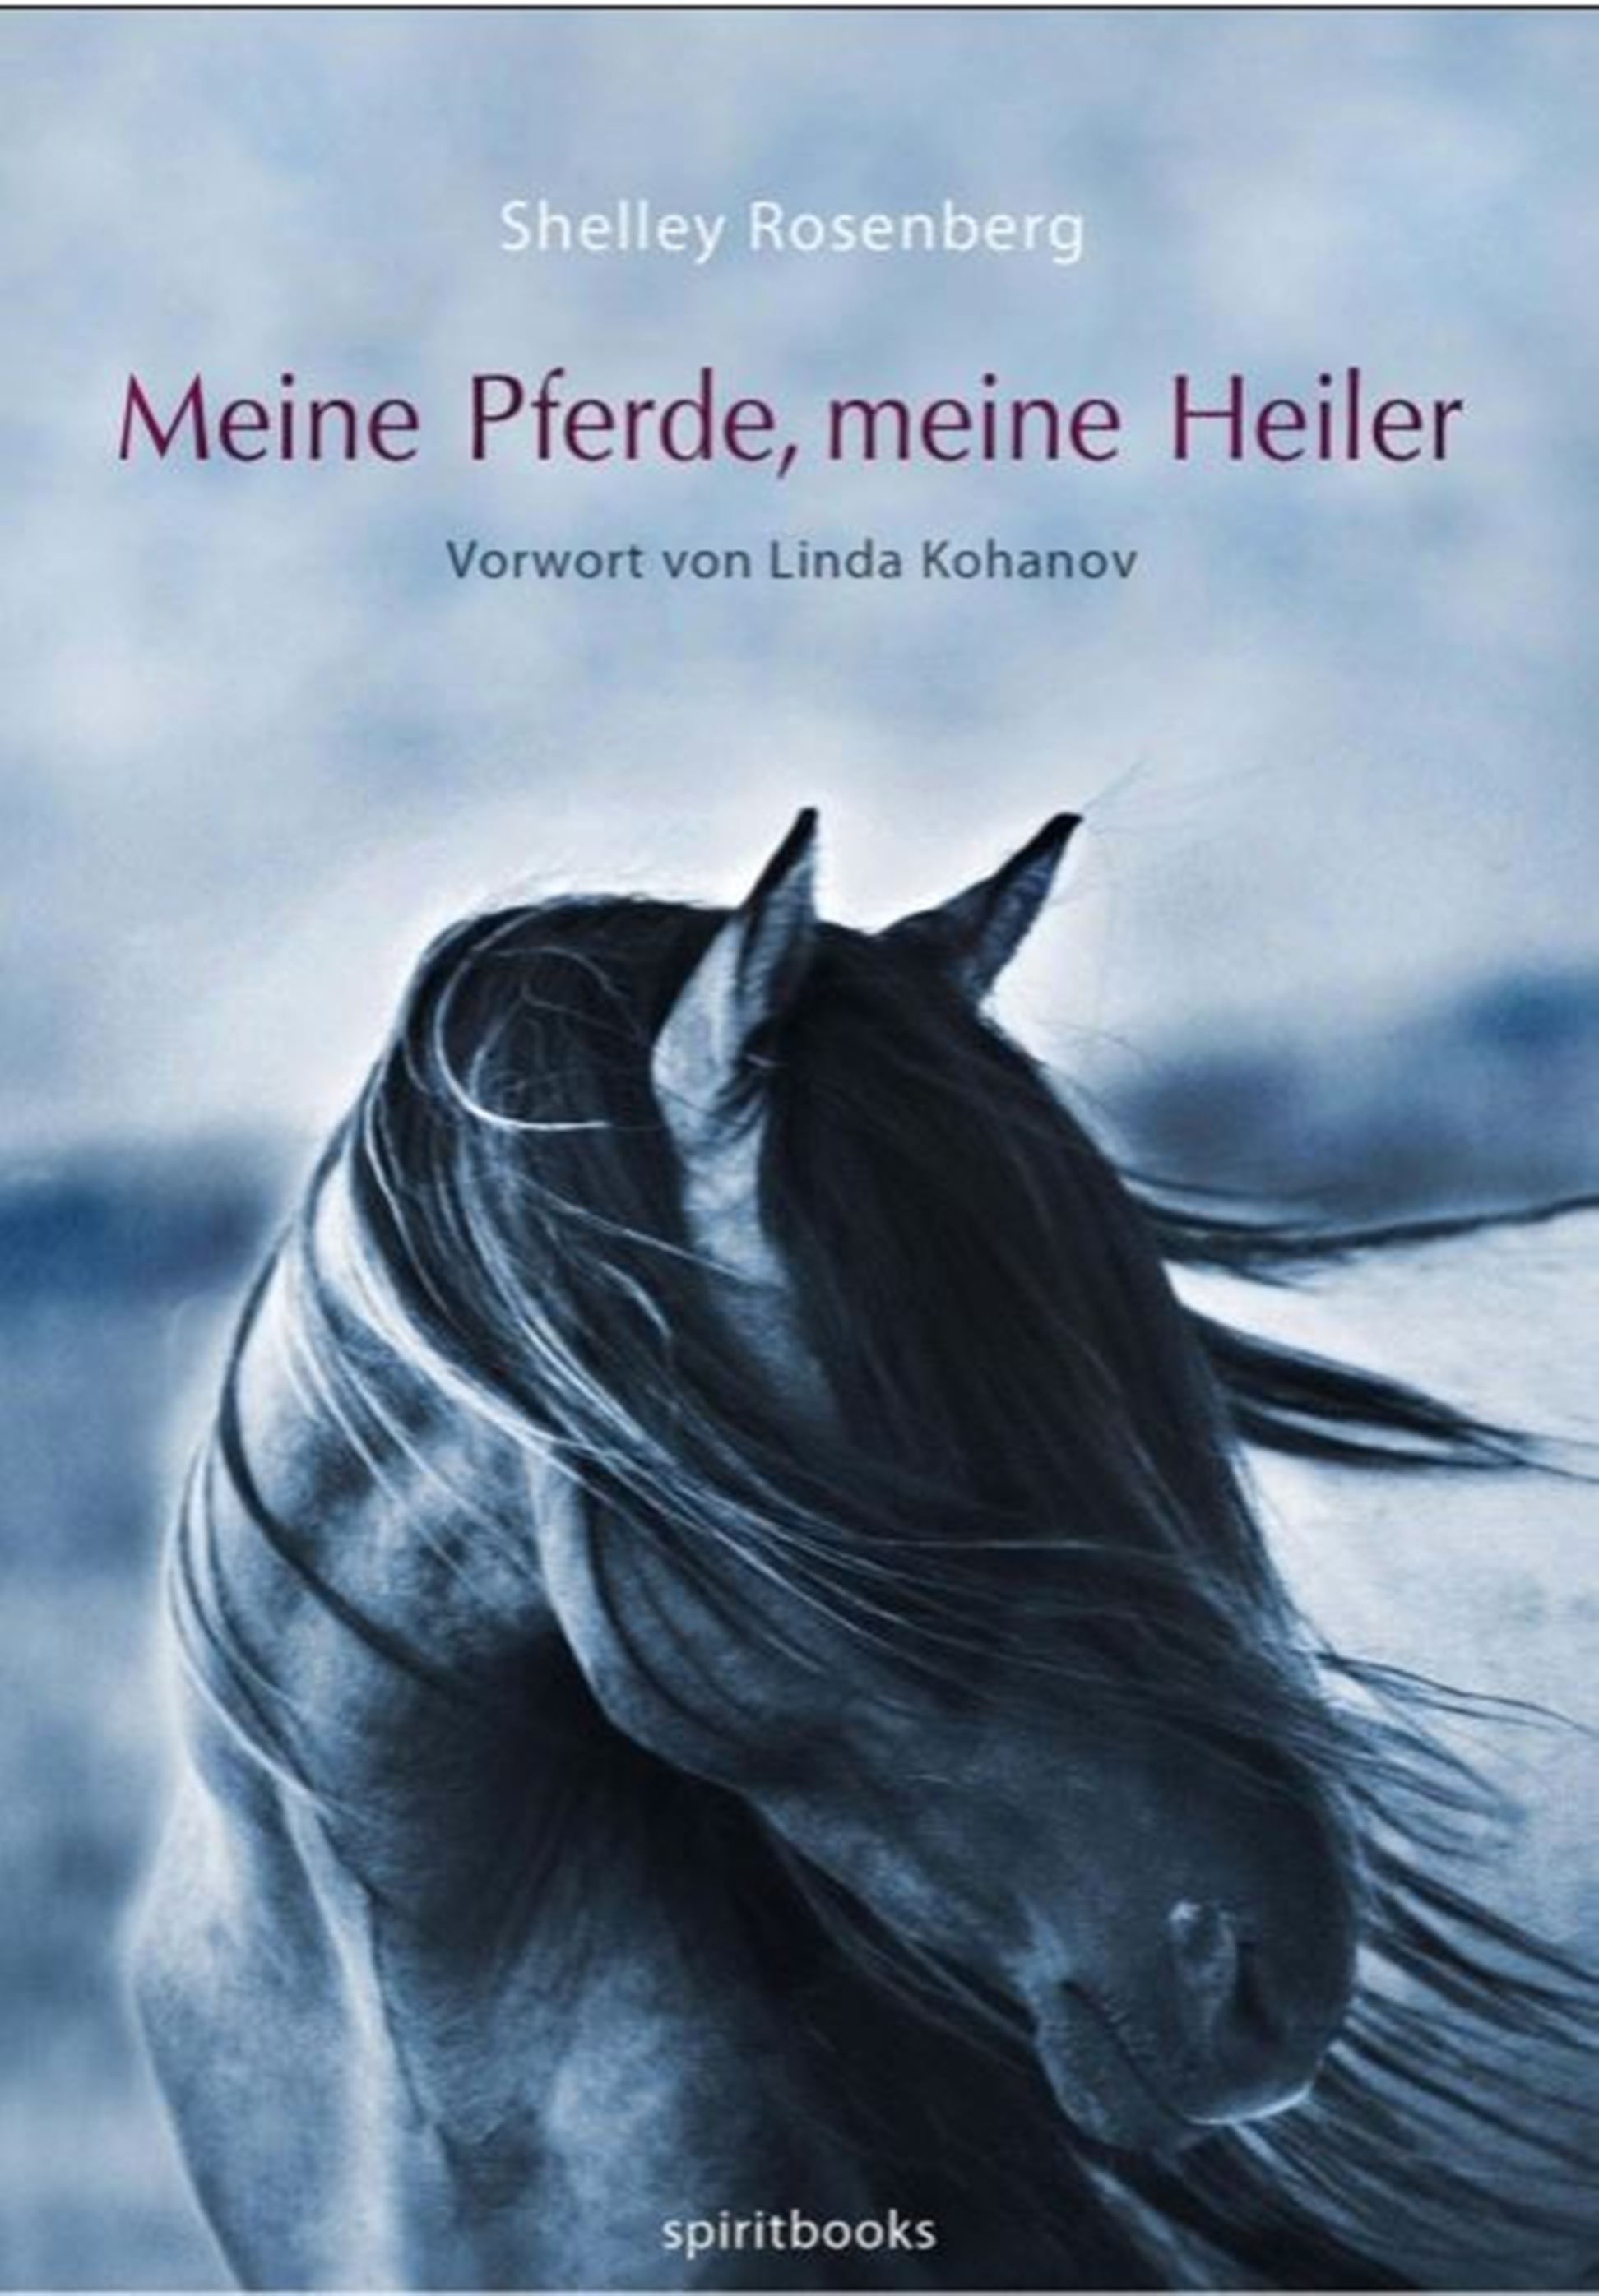 цена на Shelley Rosenberg Meine Pferde, meine Heiler